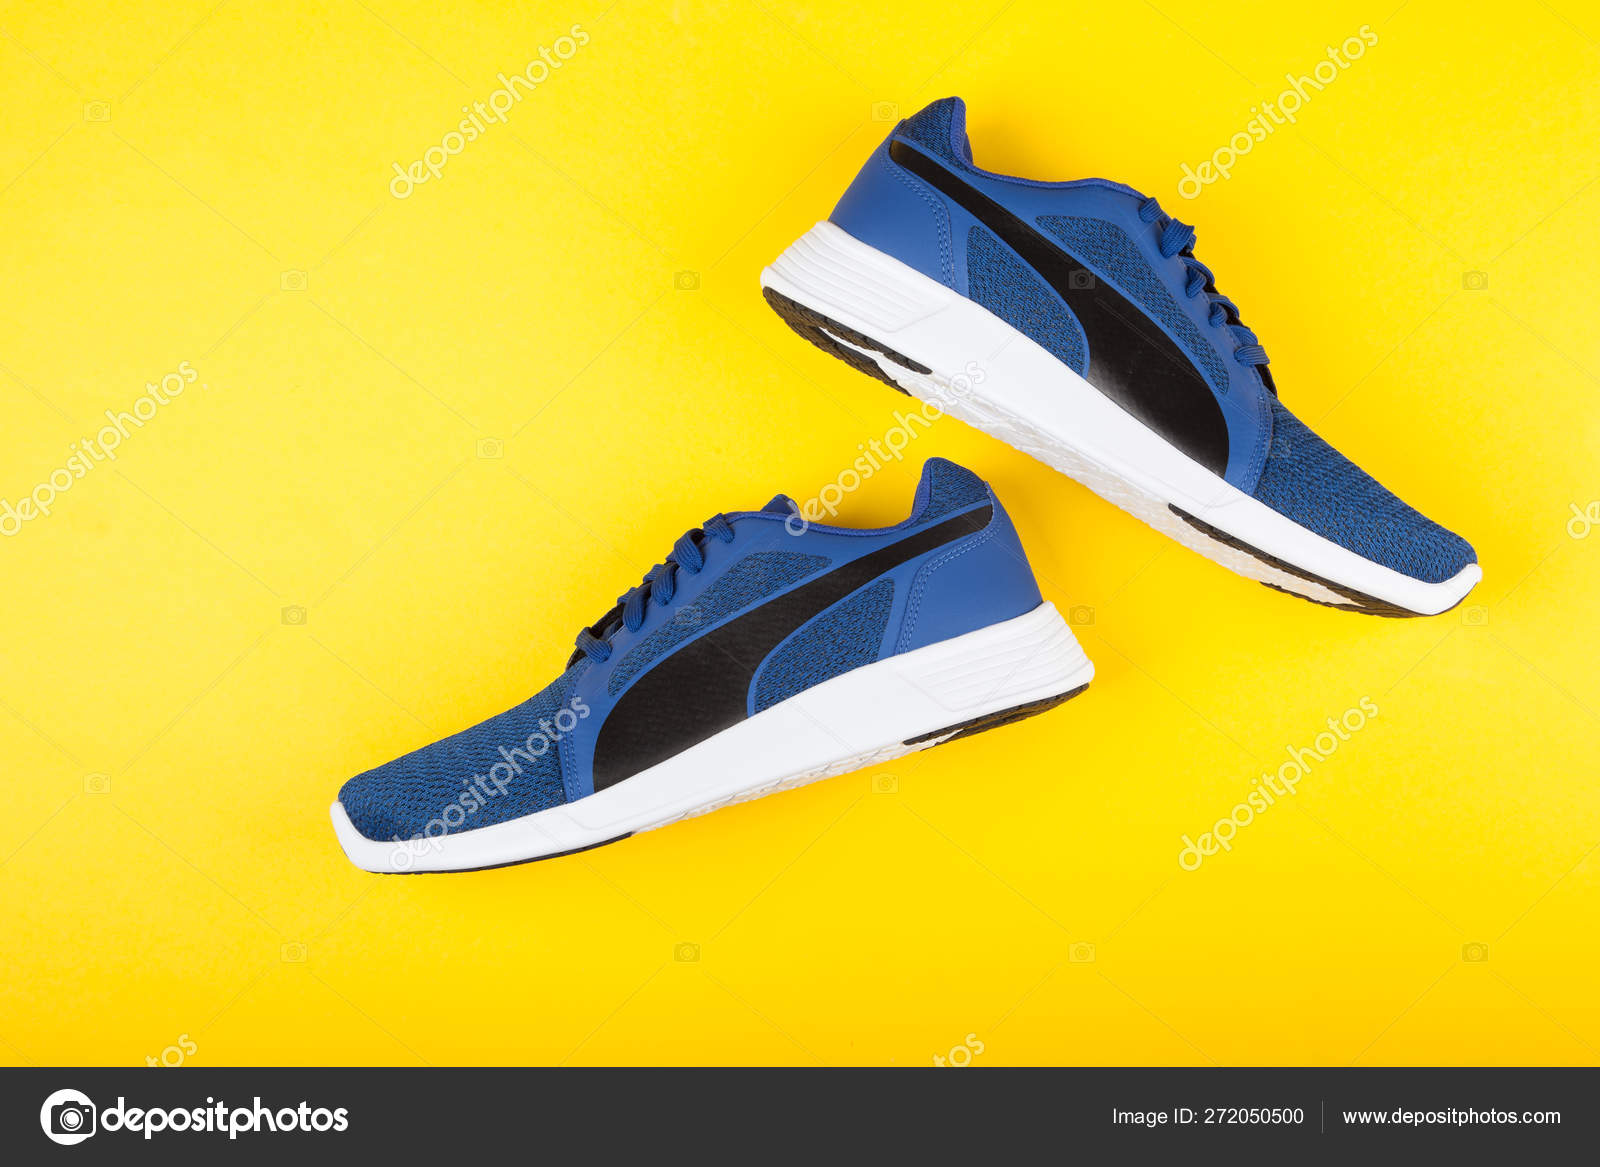 PUMA ST TRAINER EVO KNIT sport shoes on